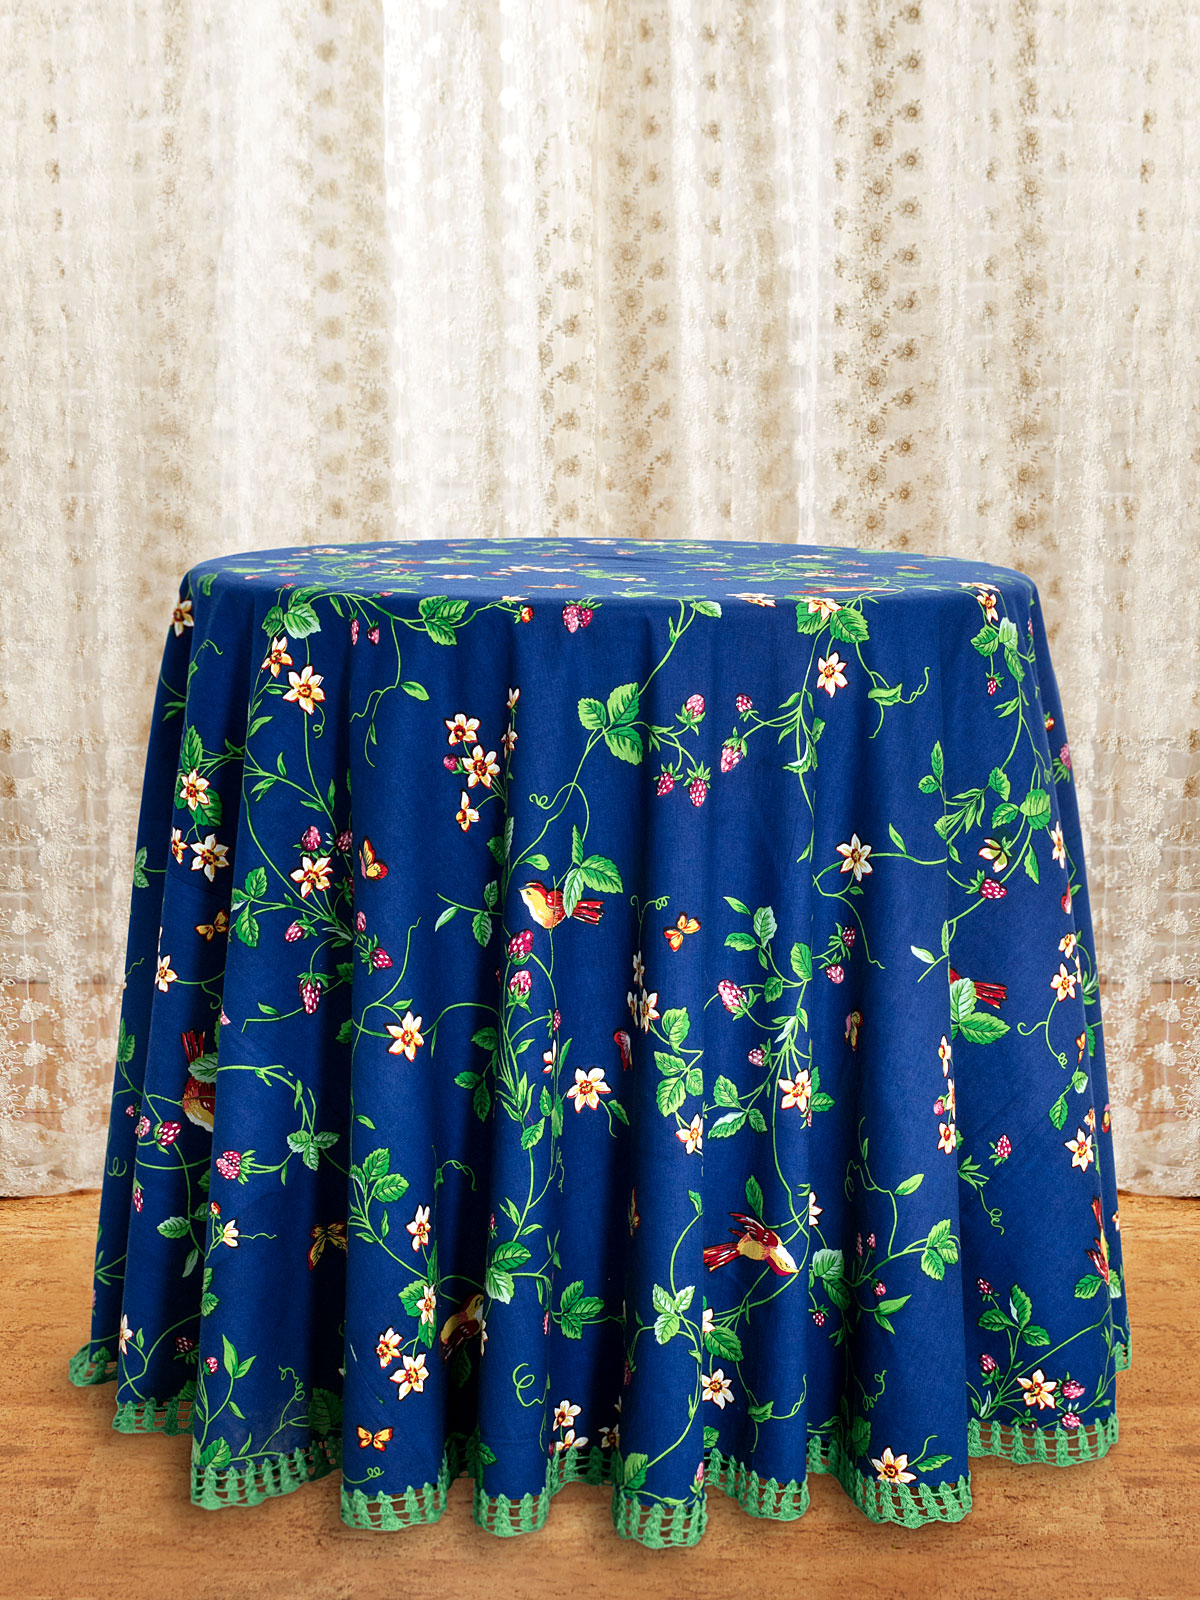 Strawberry Fields Crochet Round Tablecloth